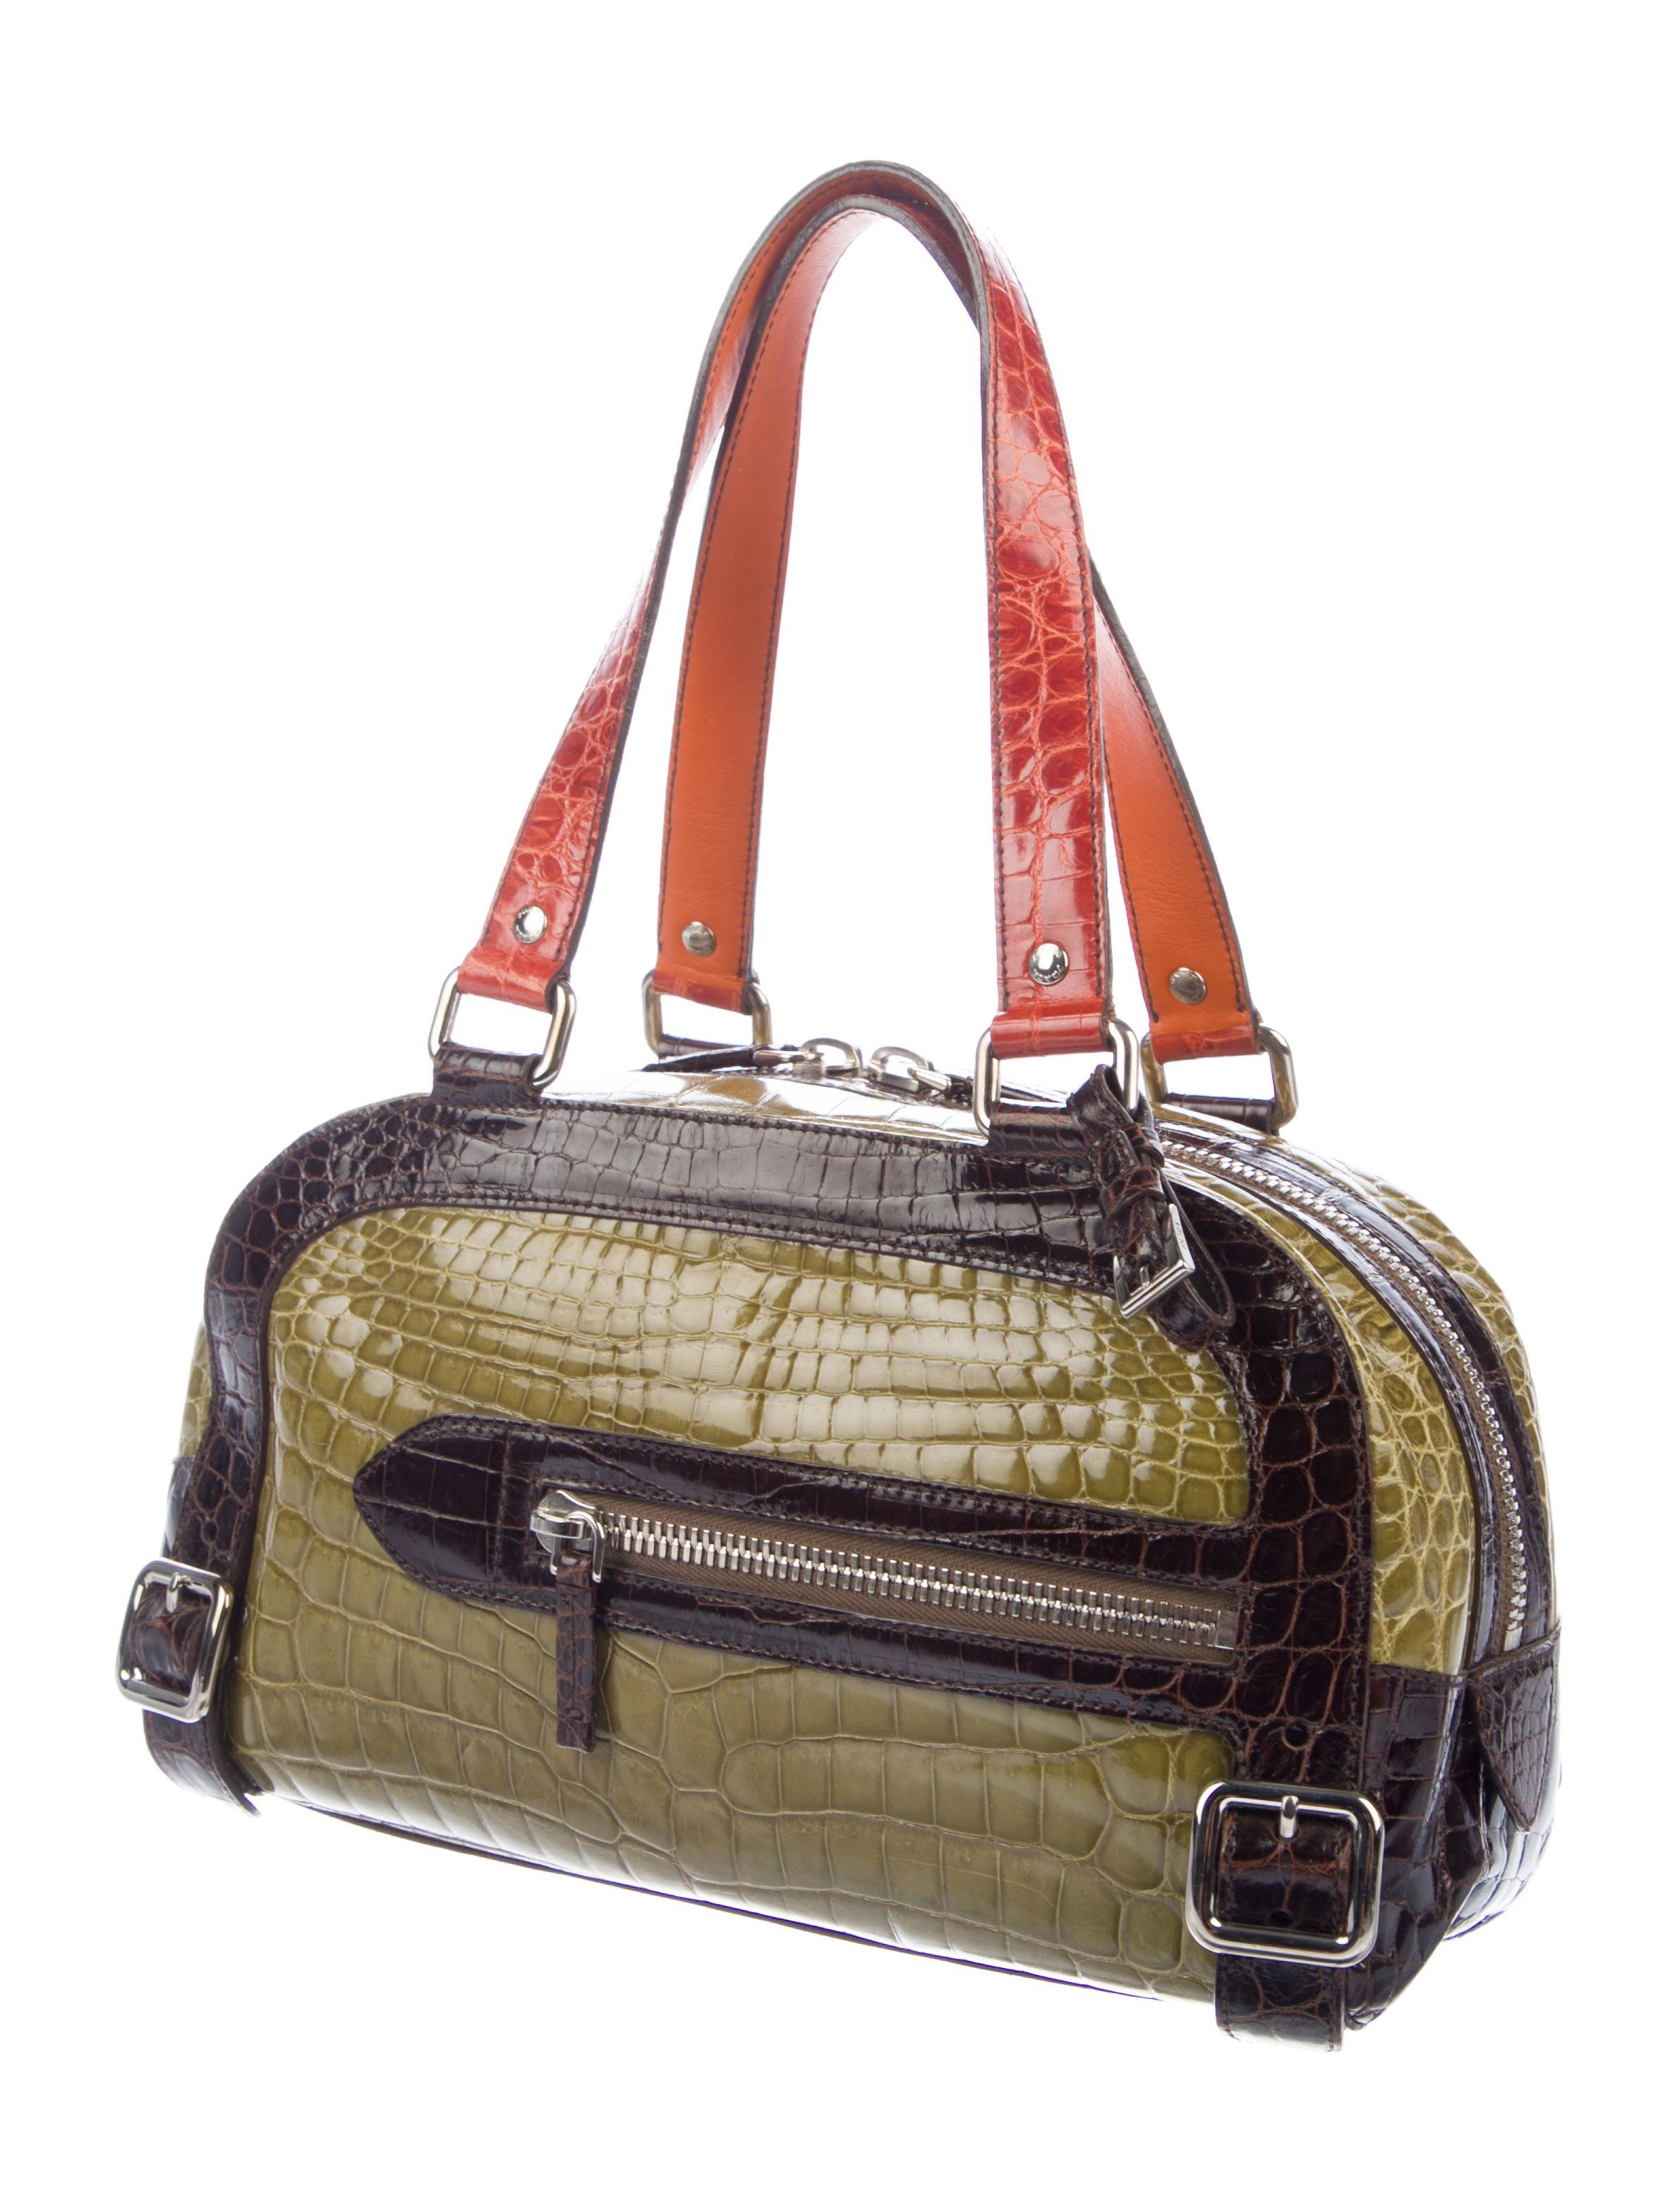 f54f934179ce Olive green, orange and walnut crocodile Prada Bauletto bag with  silver-tone hardware, dual flat shoulder straps, exterior zip pocket,  emerald leather ...